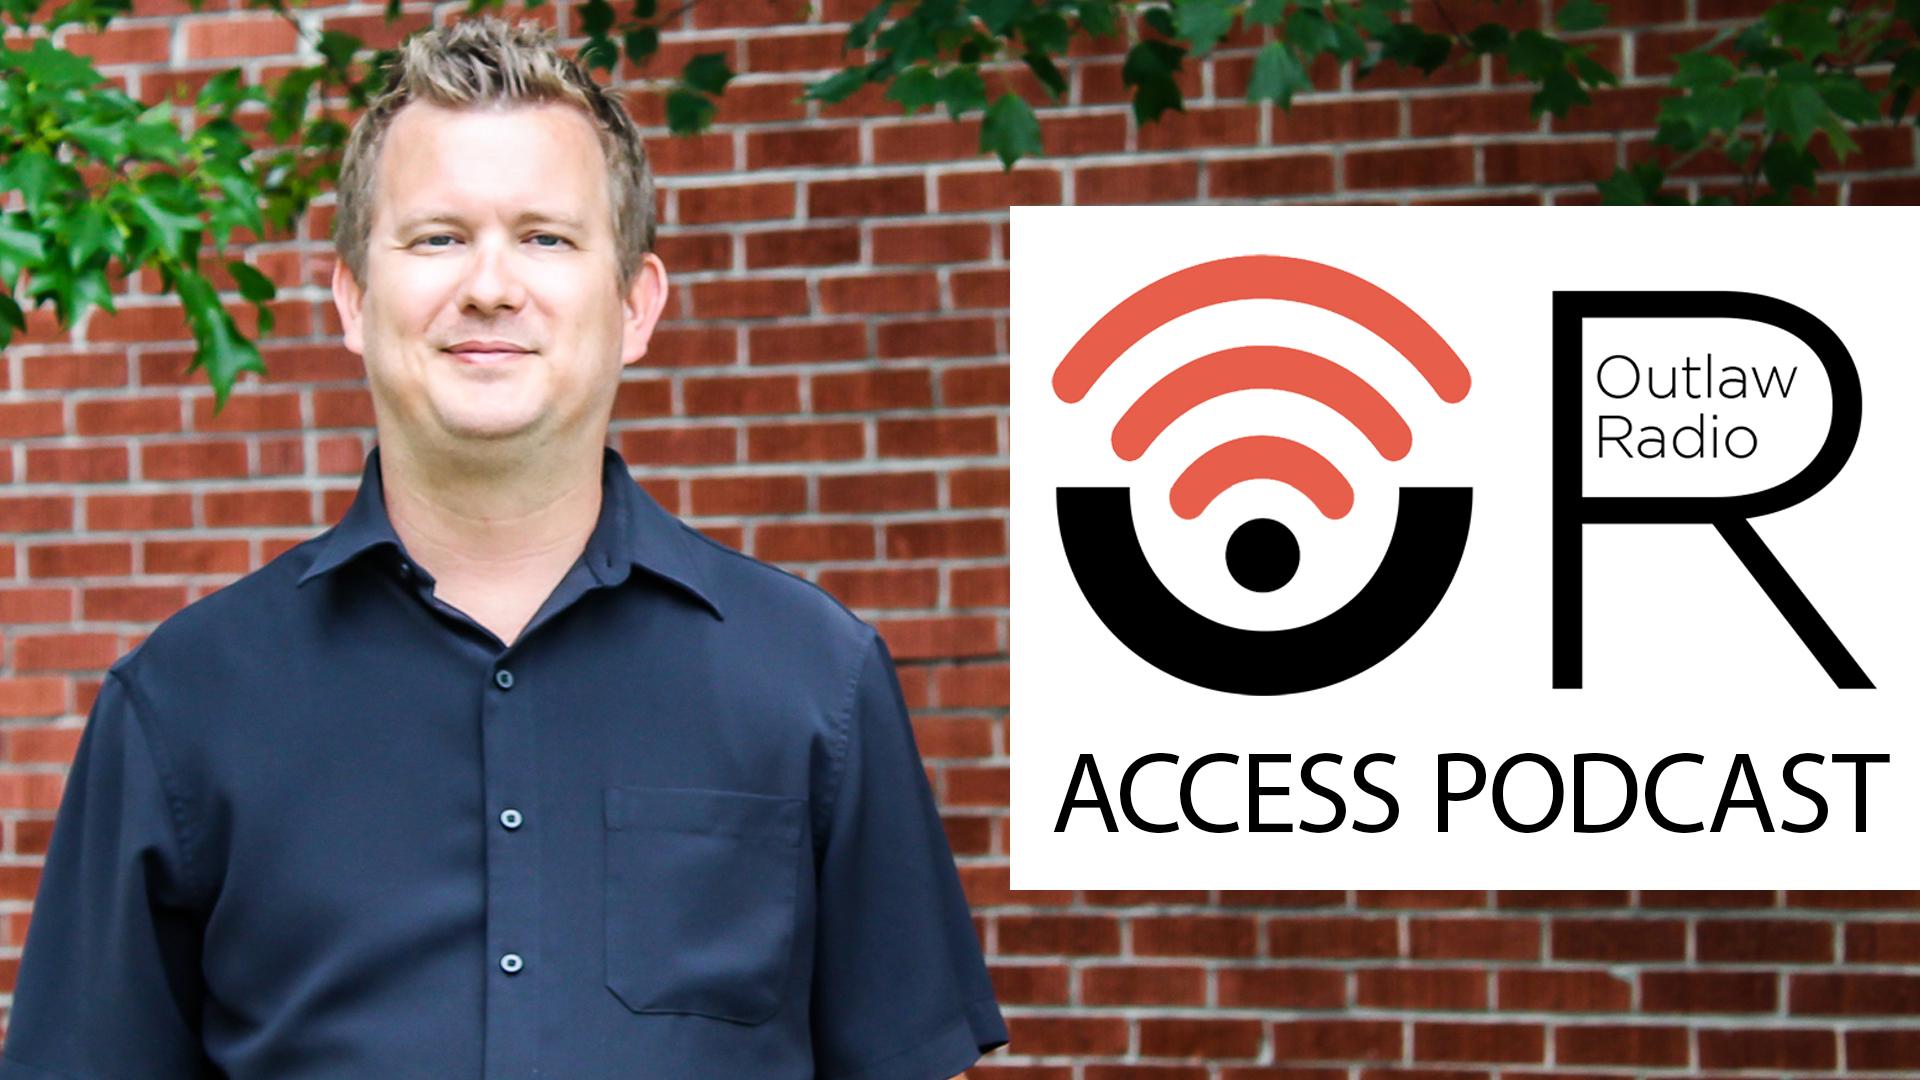 accesspodcast